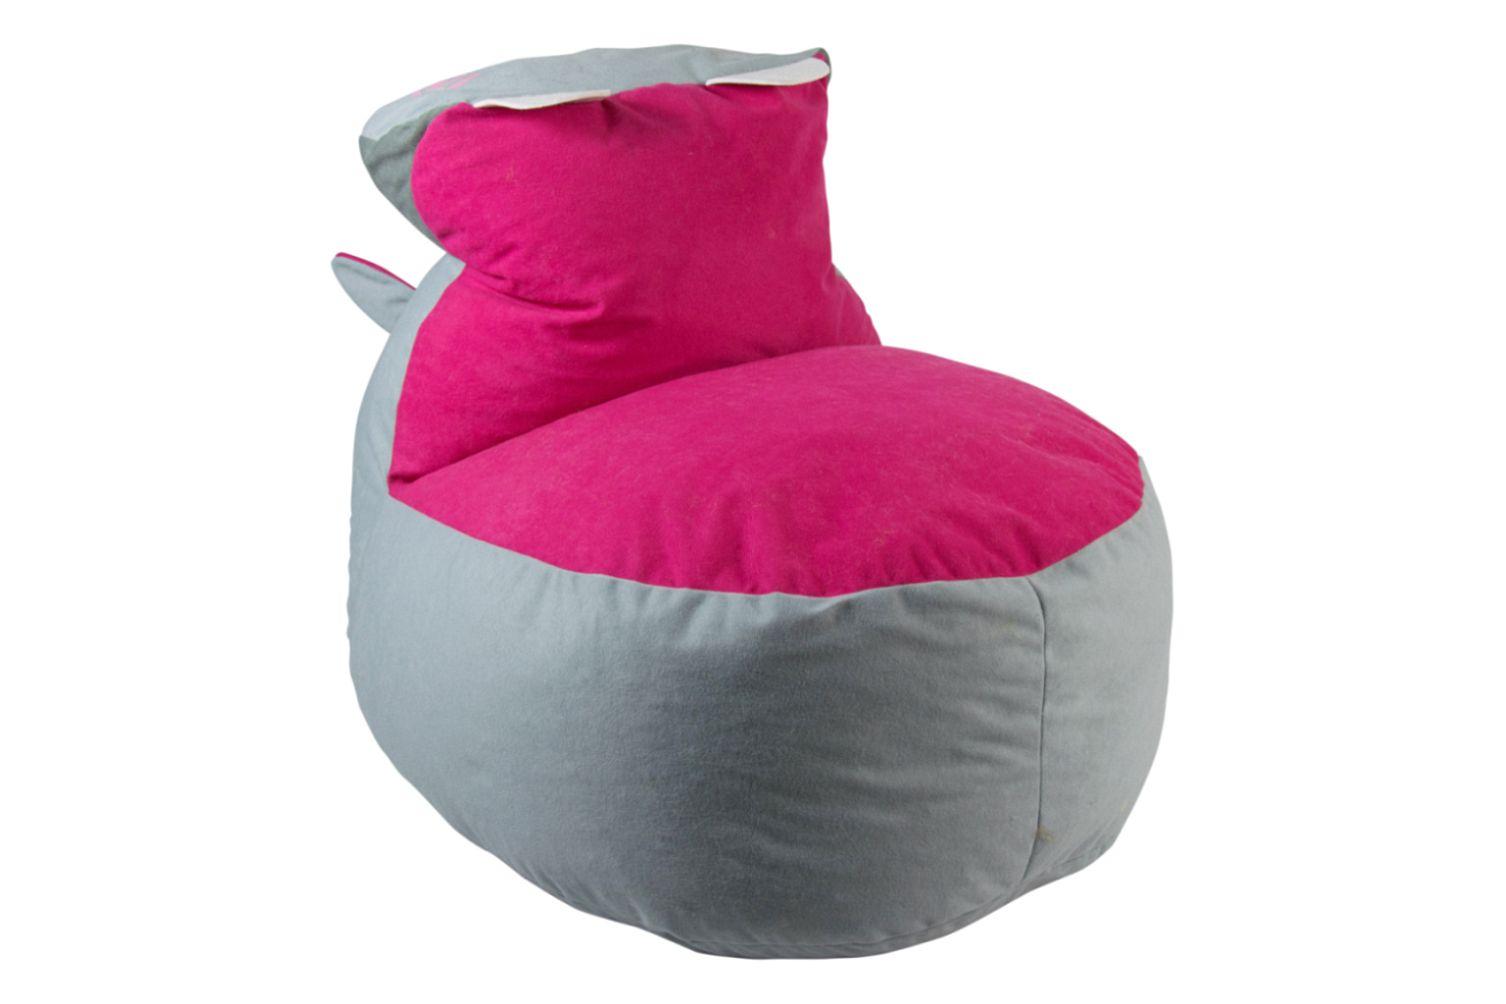 kinder sitzsack sitzs cke sitzkissen sitzsessel sessel. Black Bedroom Furniture Sets. Home Design Ideas